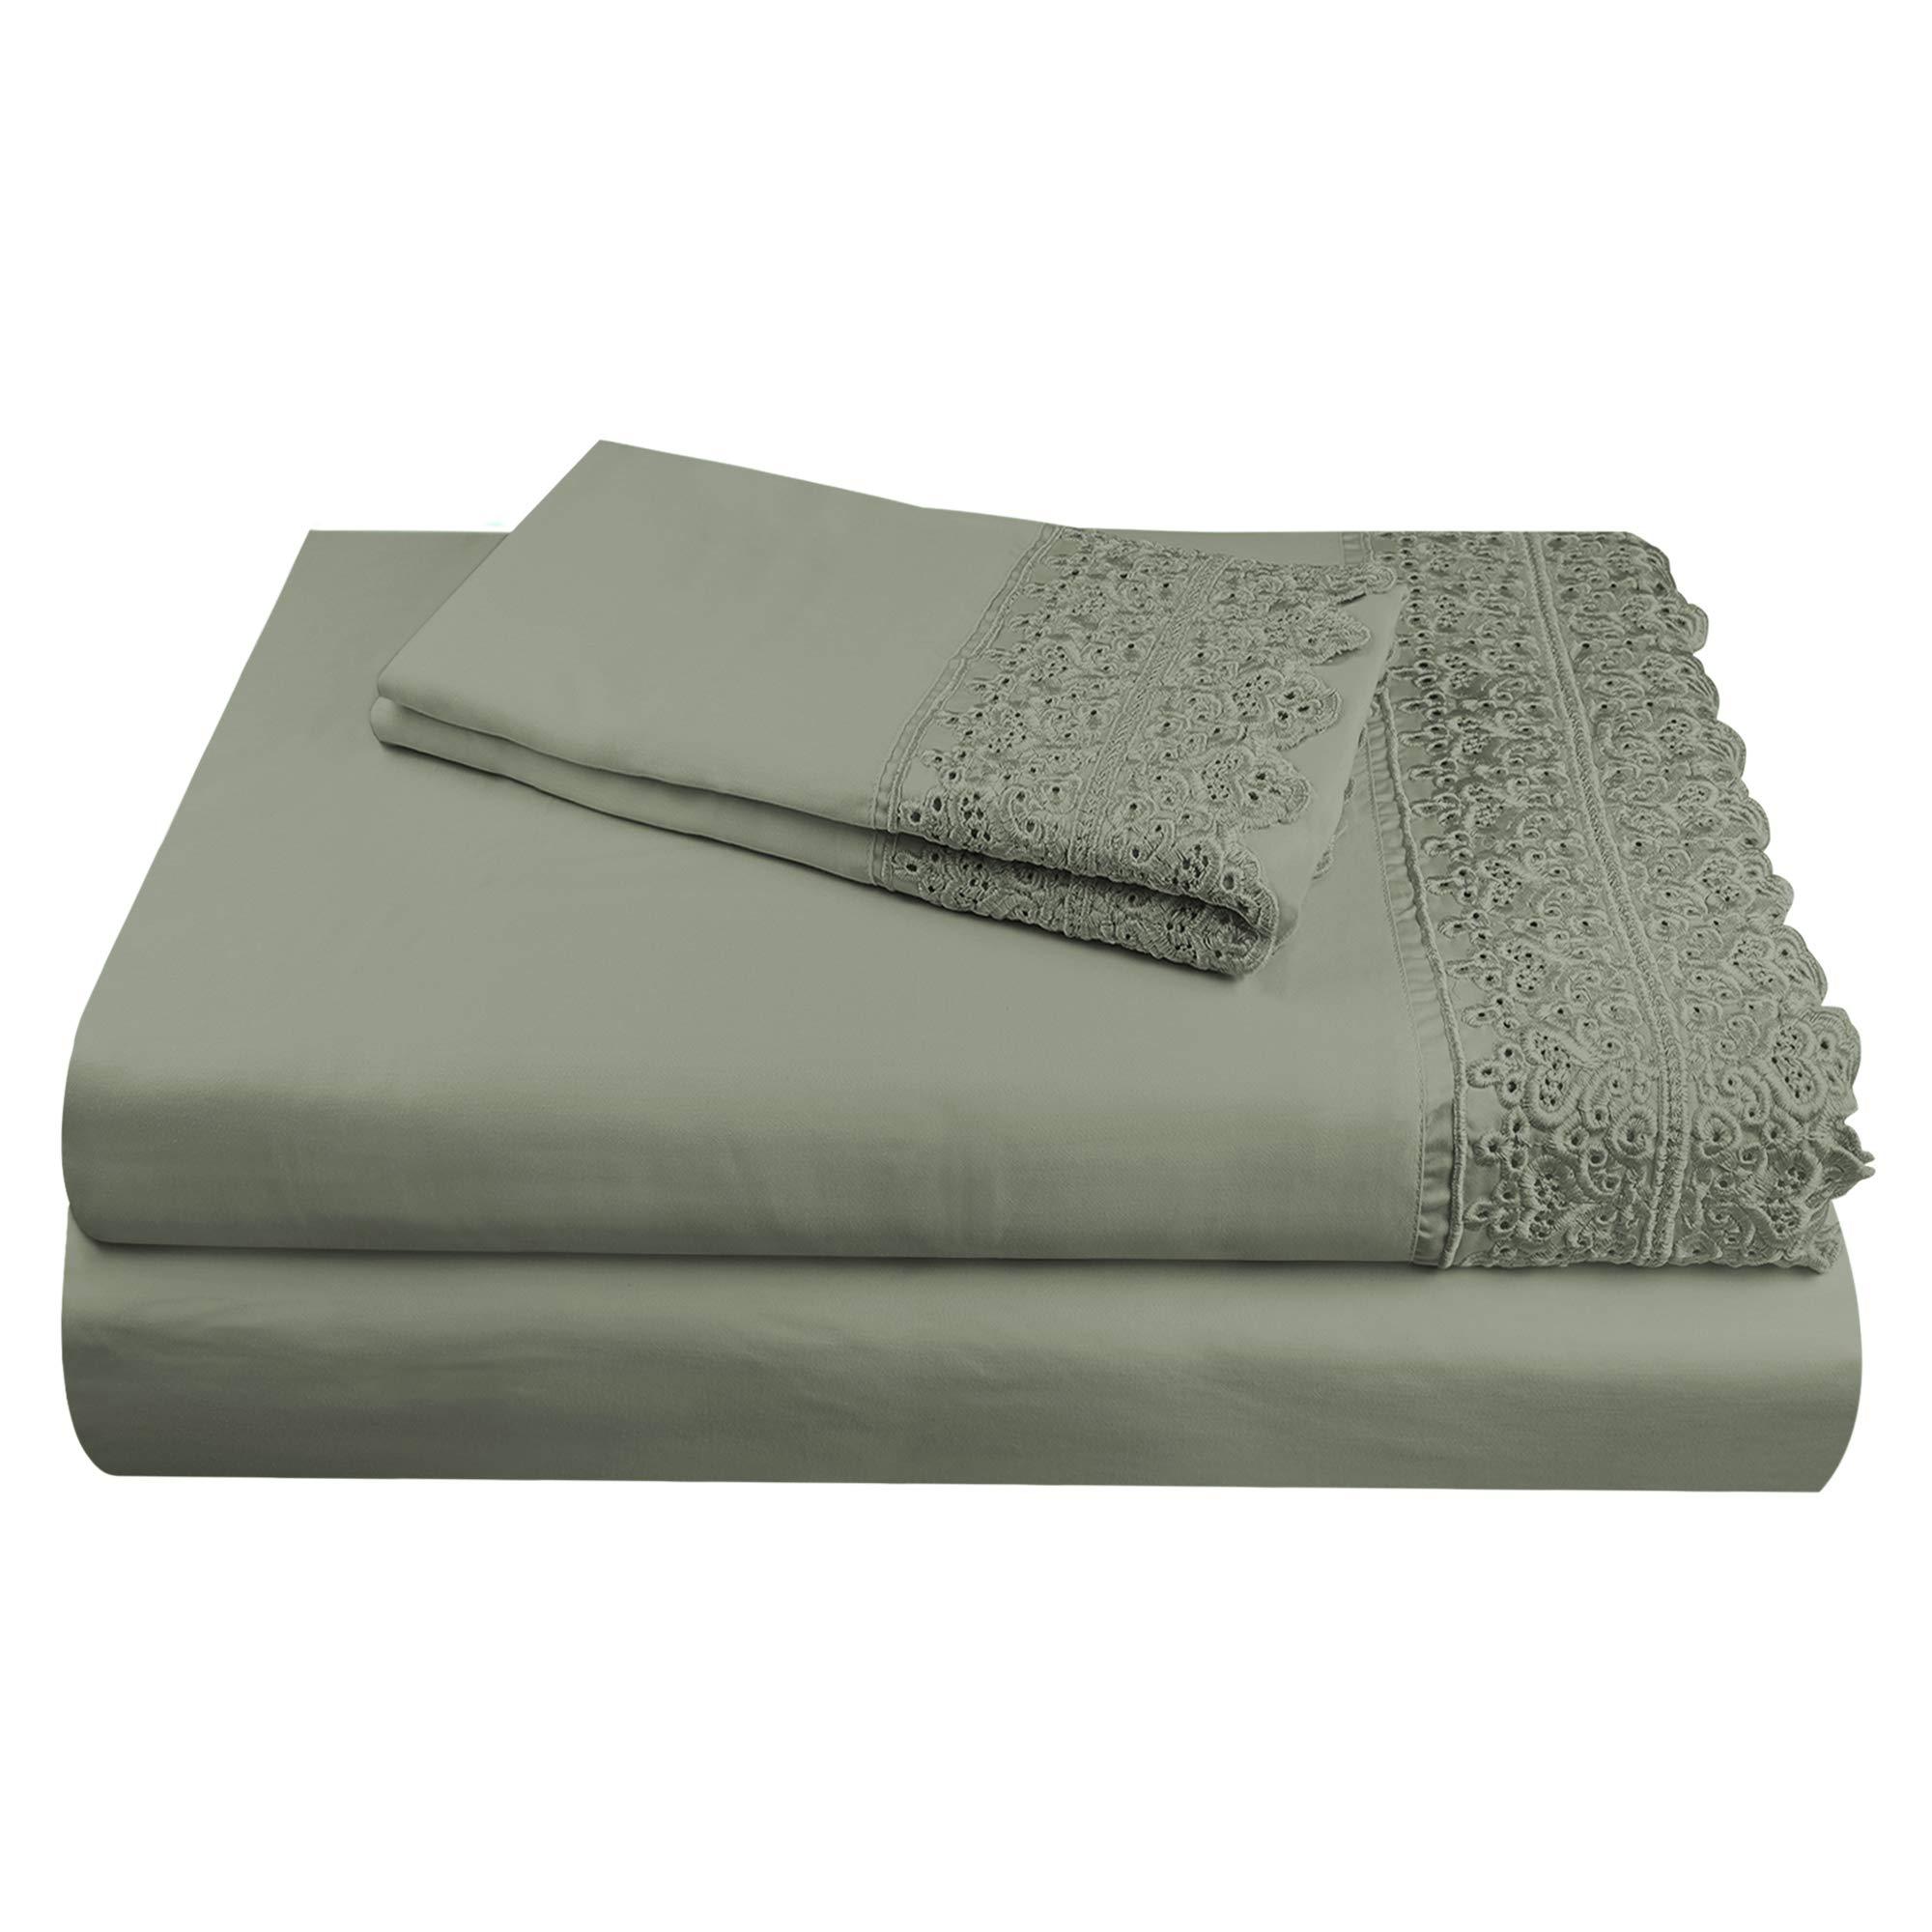 "AURAA Smart 1400 Thread Count Cotton Rich, 4 Piece Sheet Set, Queen Sheets, 16"" Deep Pocket, Artemis Lace Hem, Smooth & Soft Sateen Weave, Hotel Quality, Charcoal"